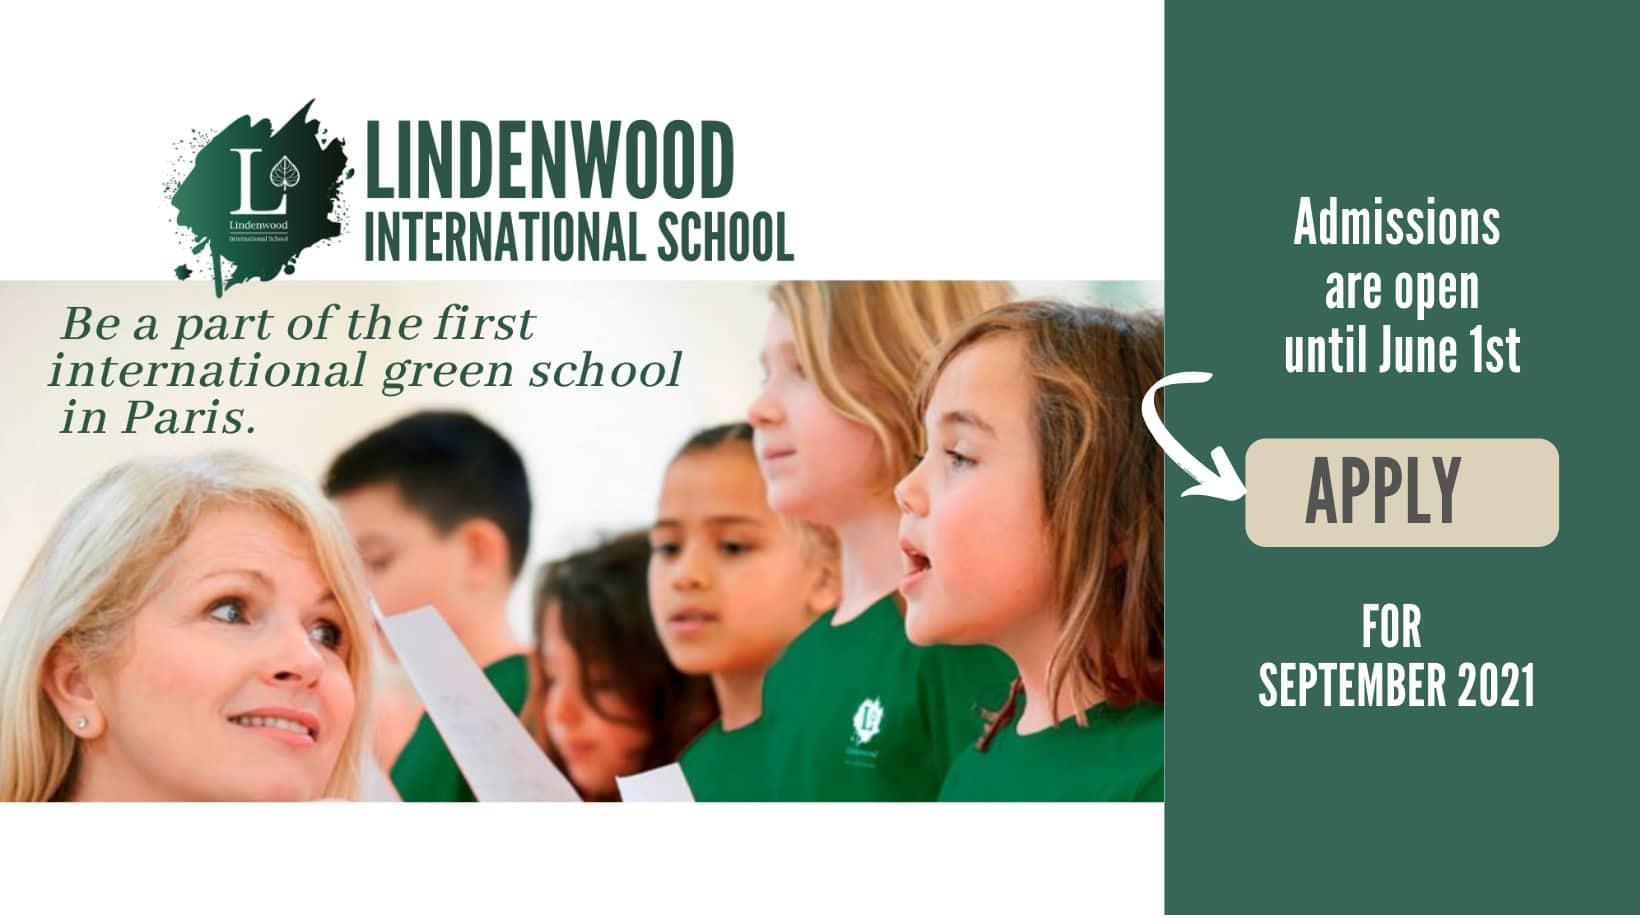 Lindenwood admission 2021 2022